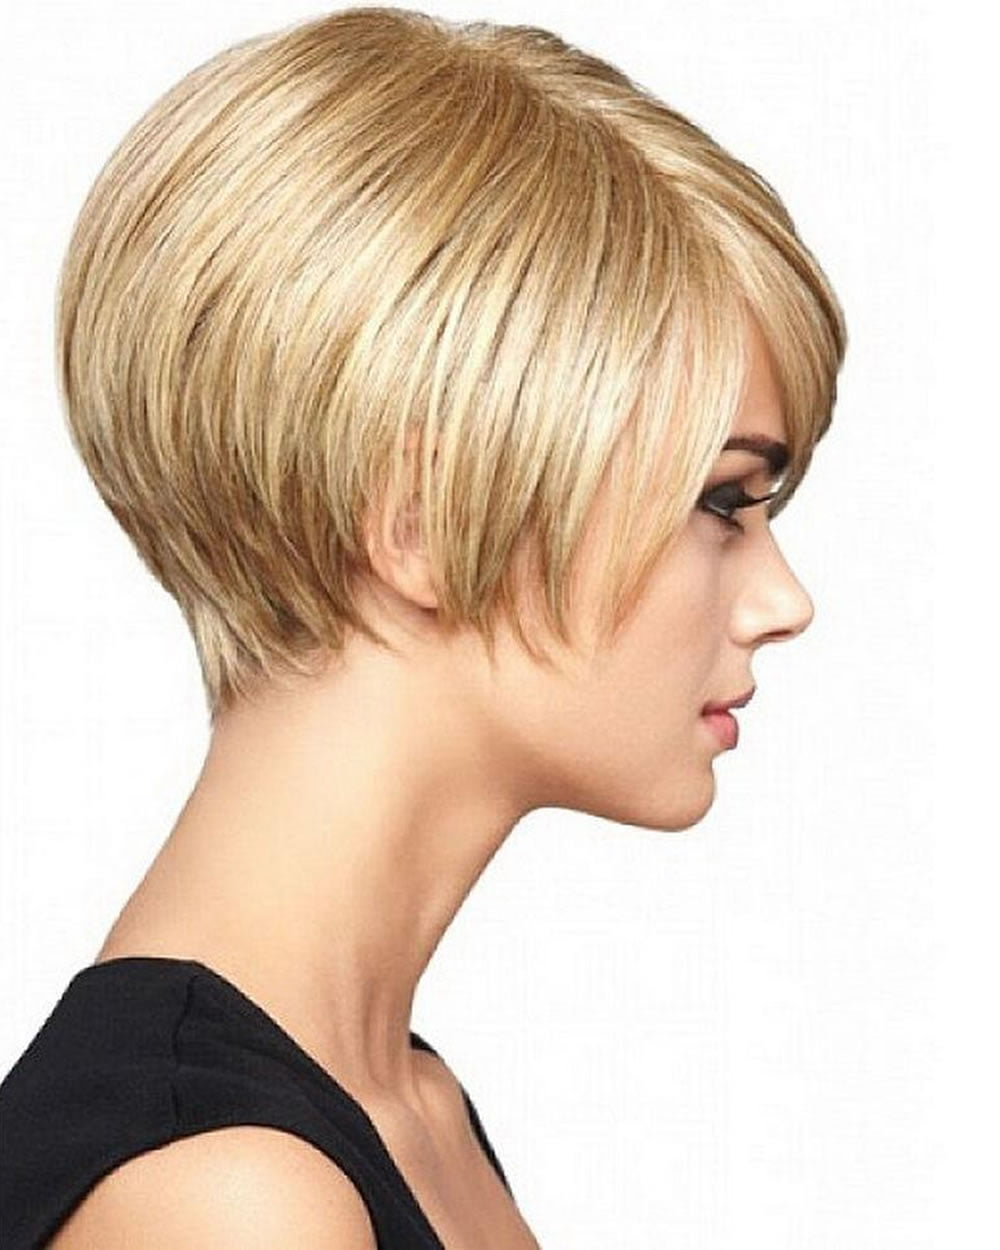 Short Bob Hairstyles Haircuts For Women 2018 2019 Light Blonde